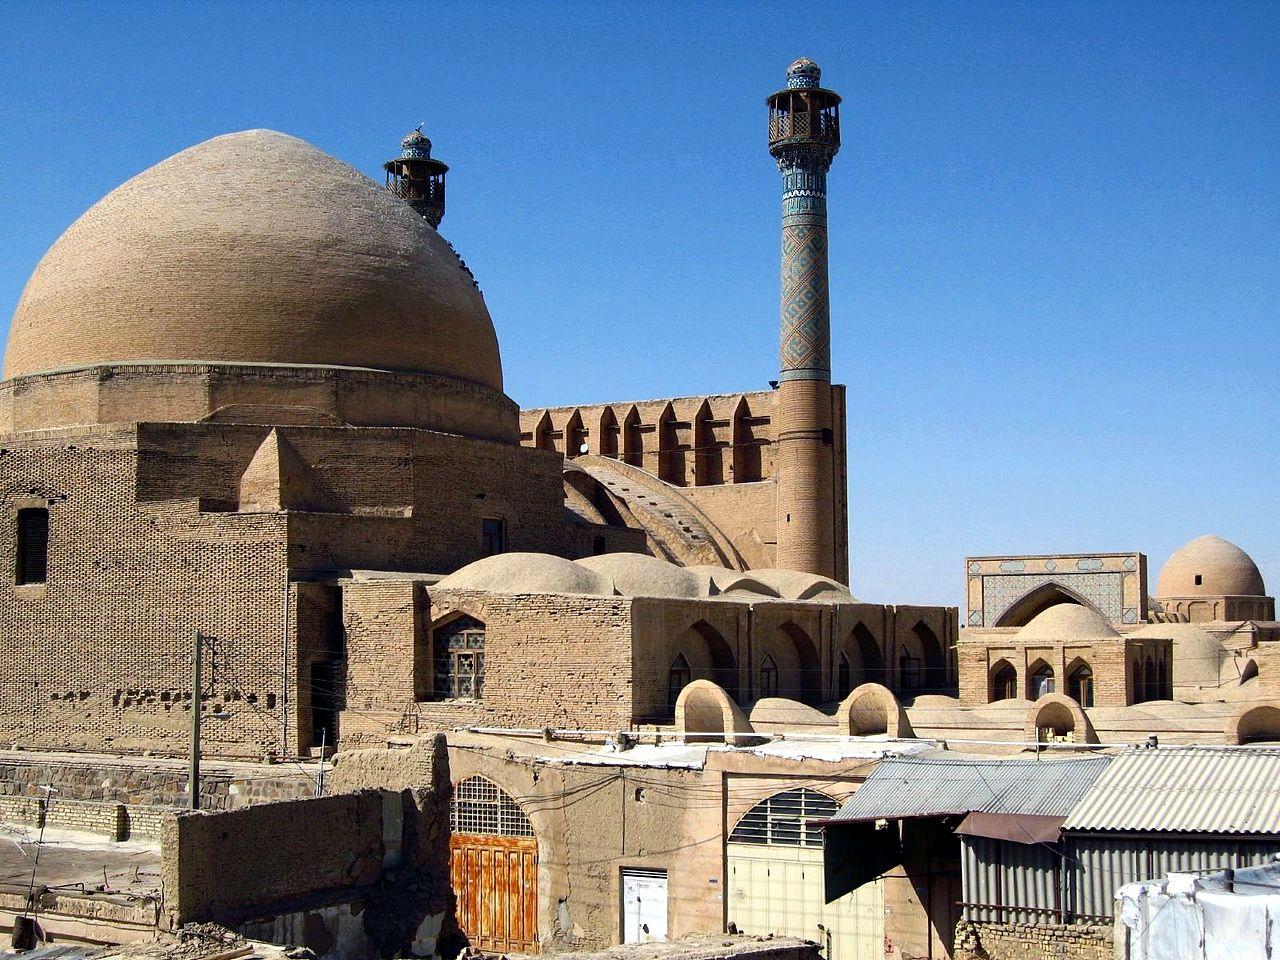 Esfahan (Isfahan), photo by Fulvio Spada